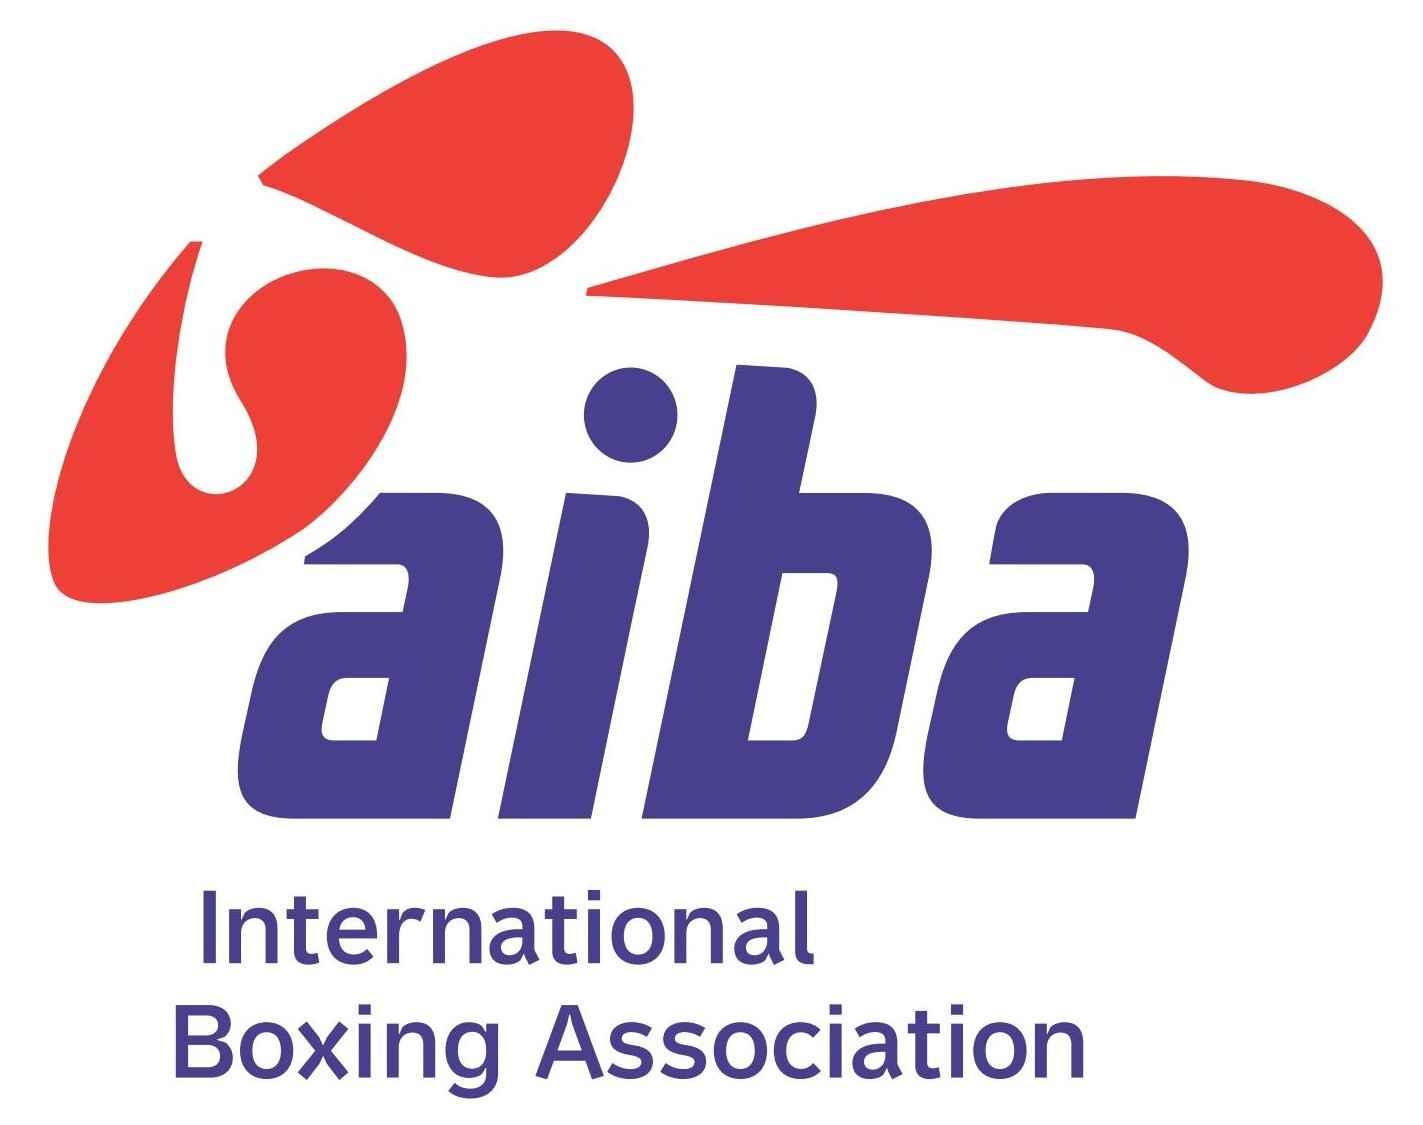 International Boxing Association (AIBA) Logo png